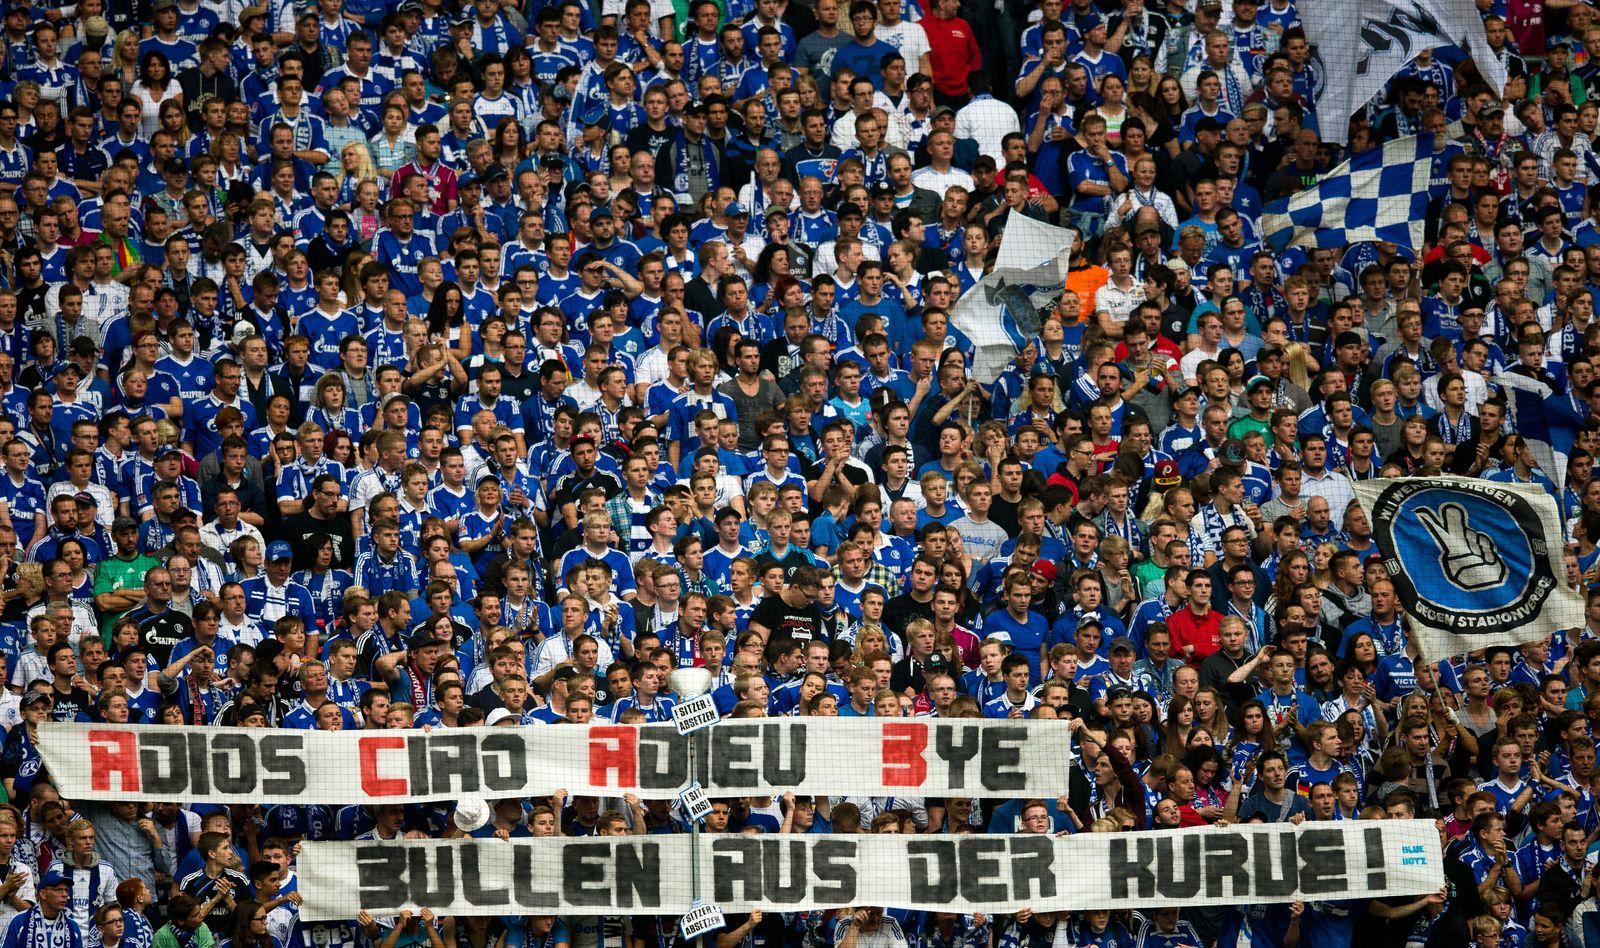 Schalke-Fans leverkusen banner